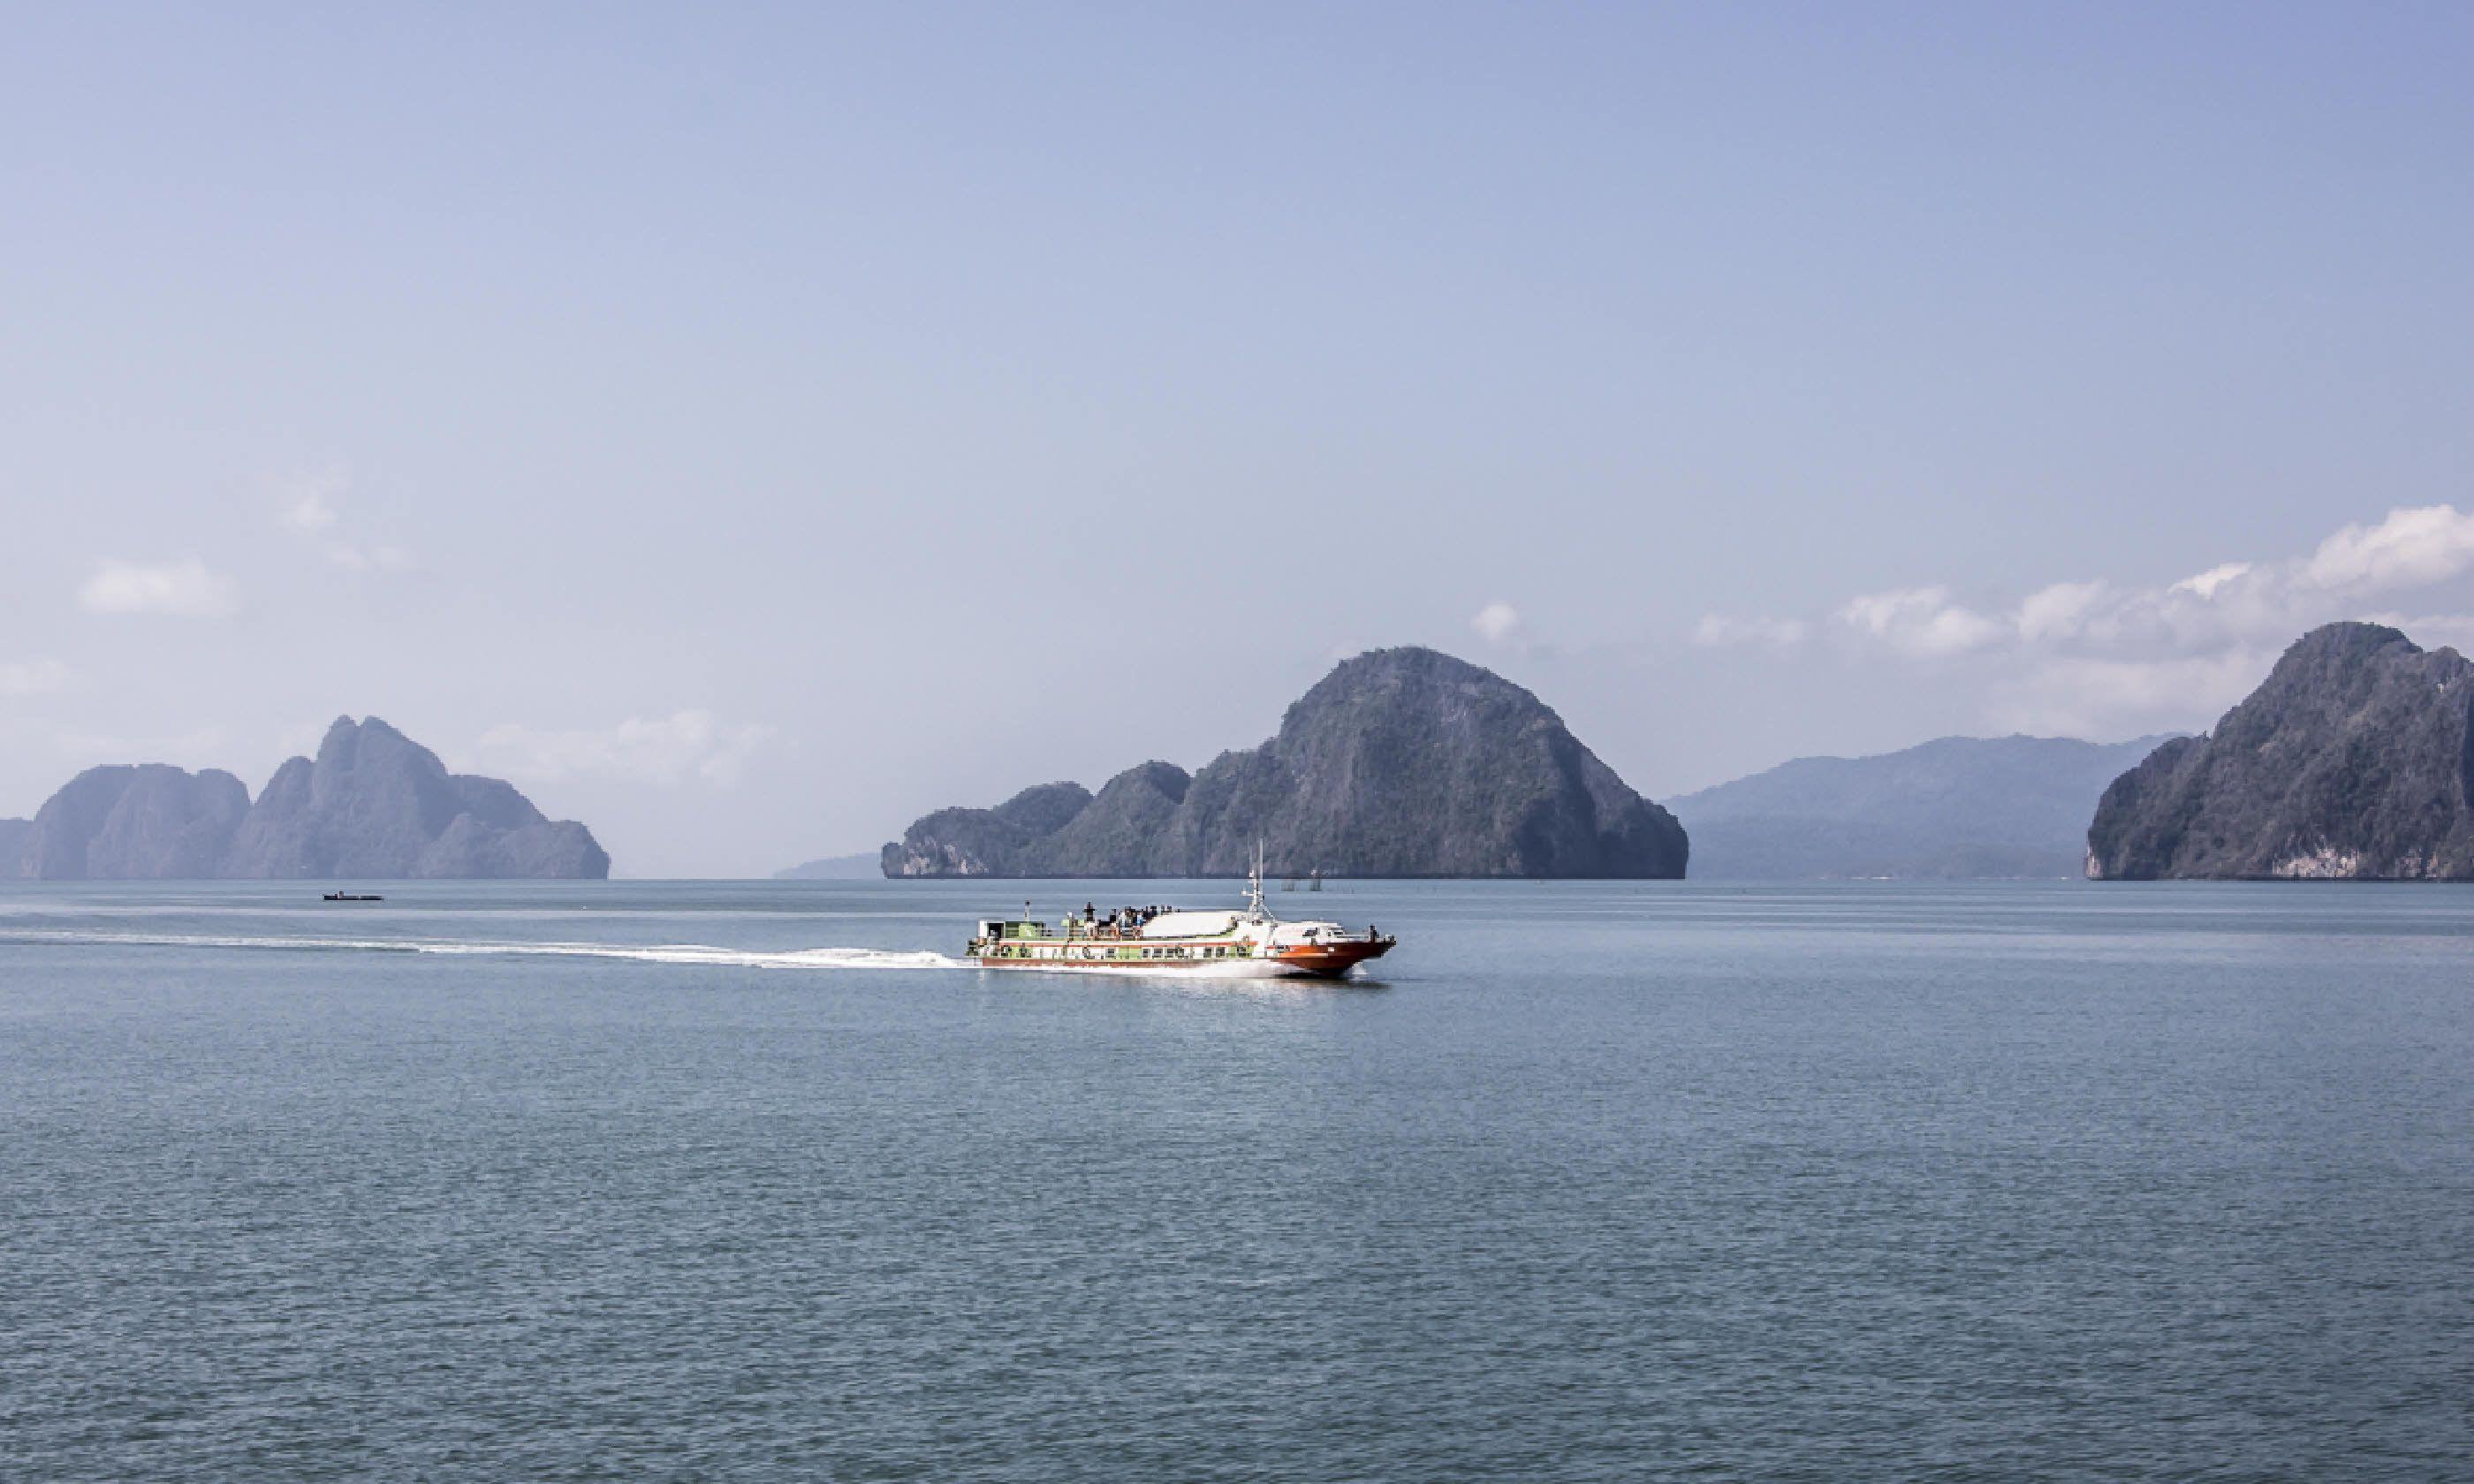 Myeik Archipelago (Shutterstock)